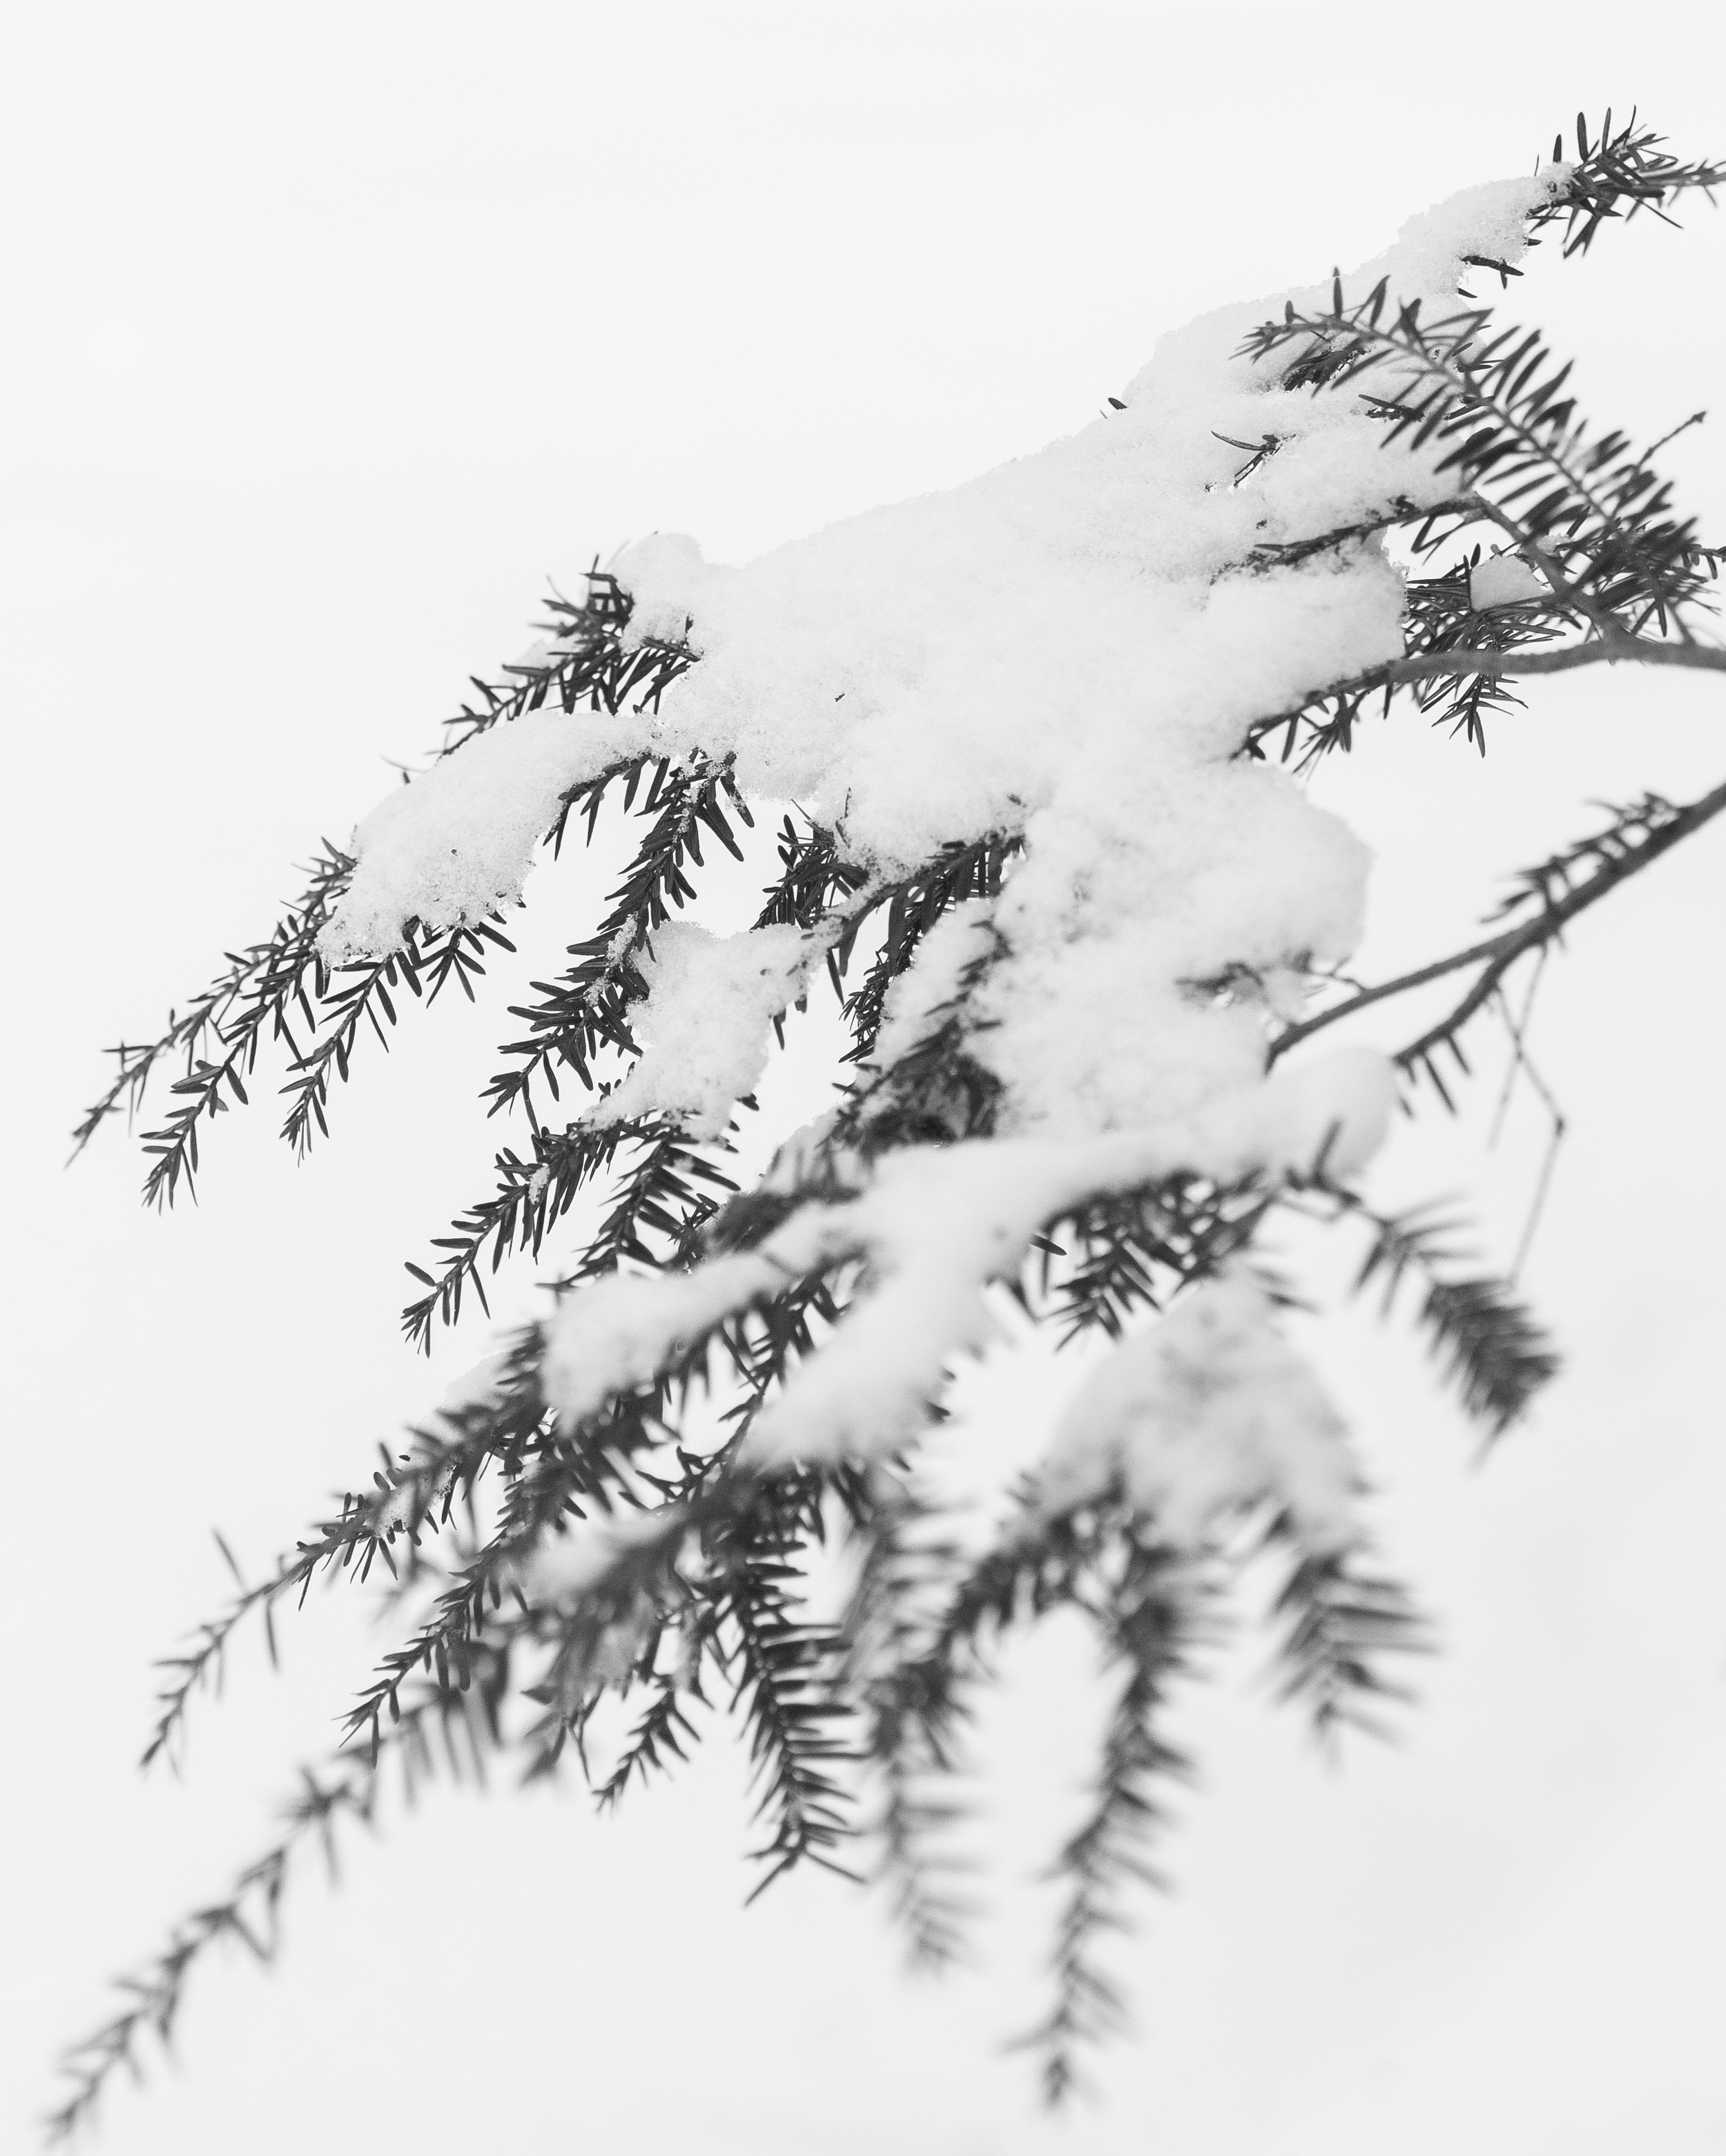 winter-.jpg